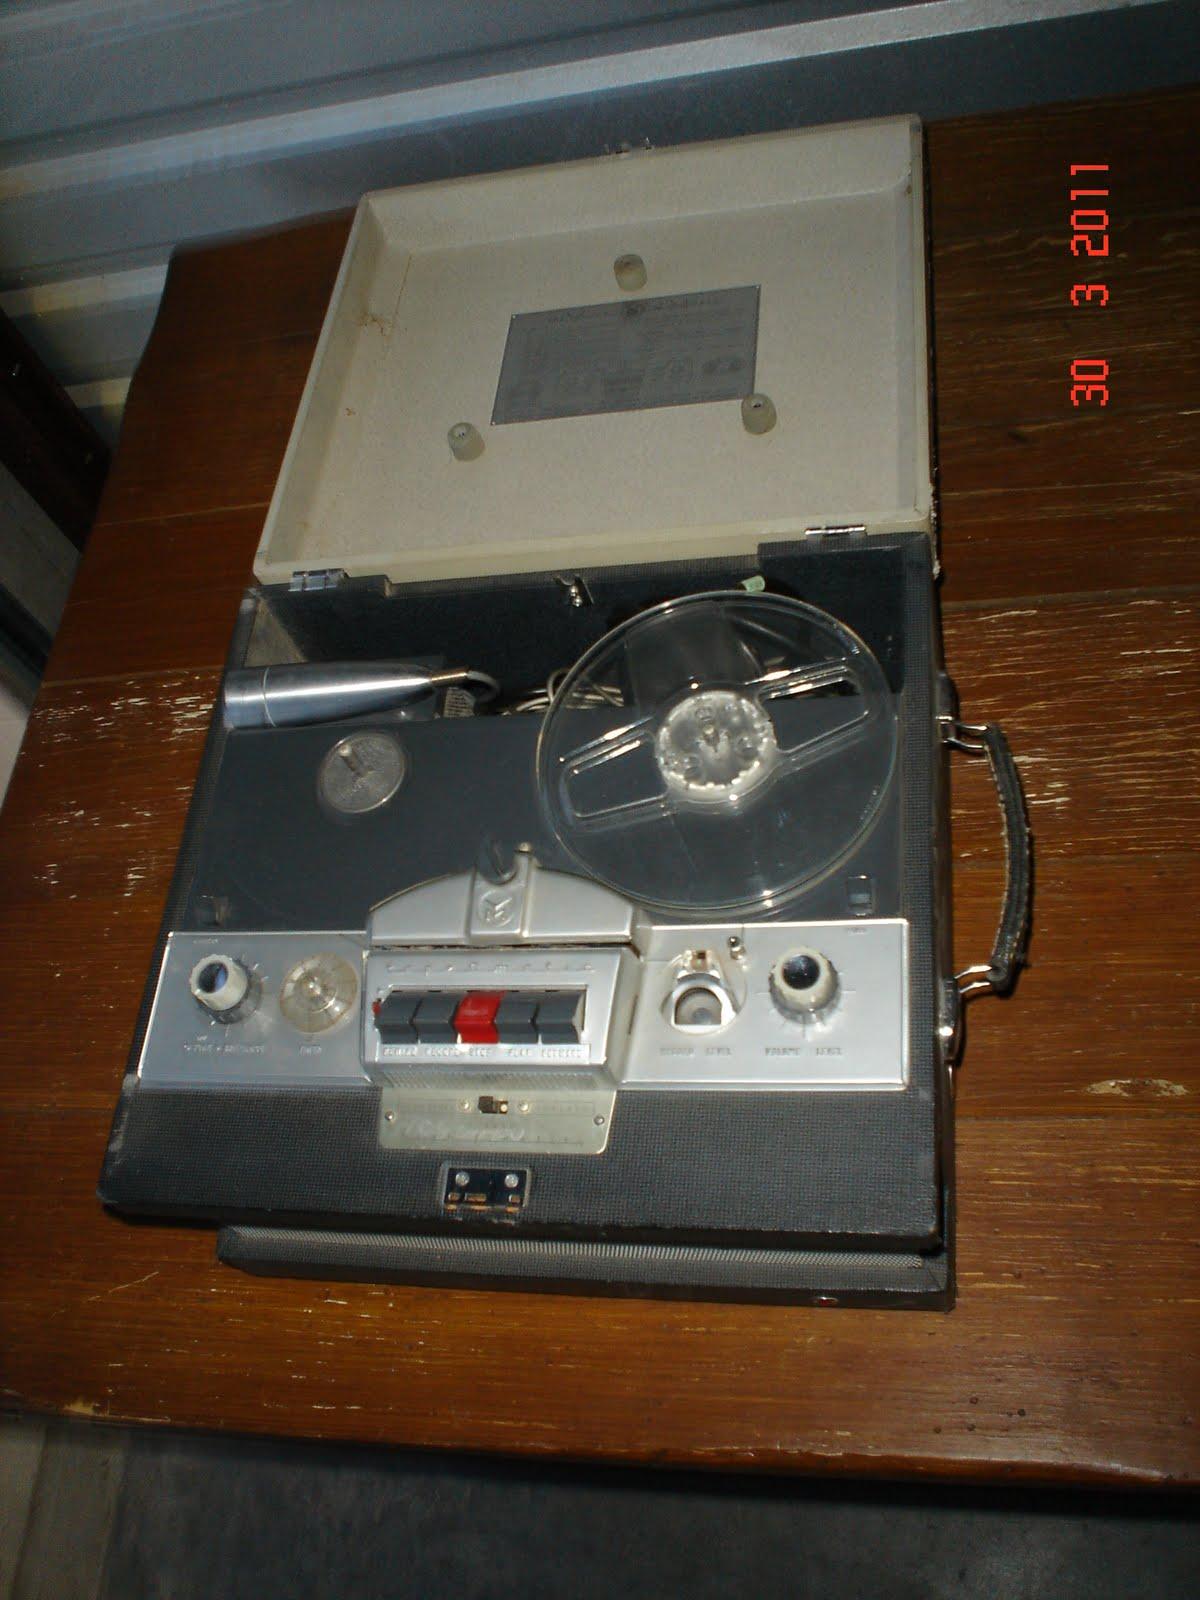 The Storage Princess Vintage Reel To Reel Tape Recorder